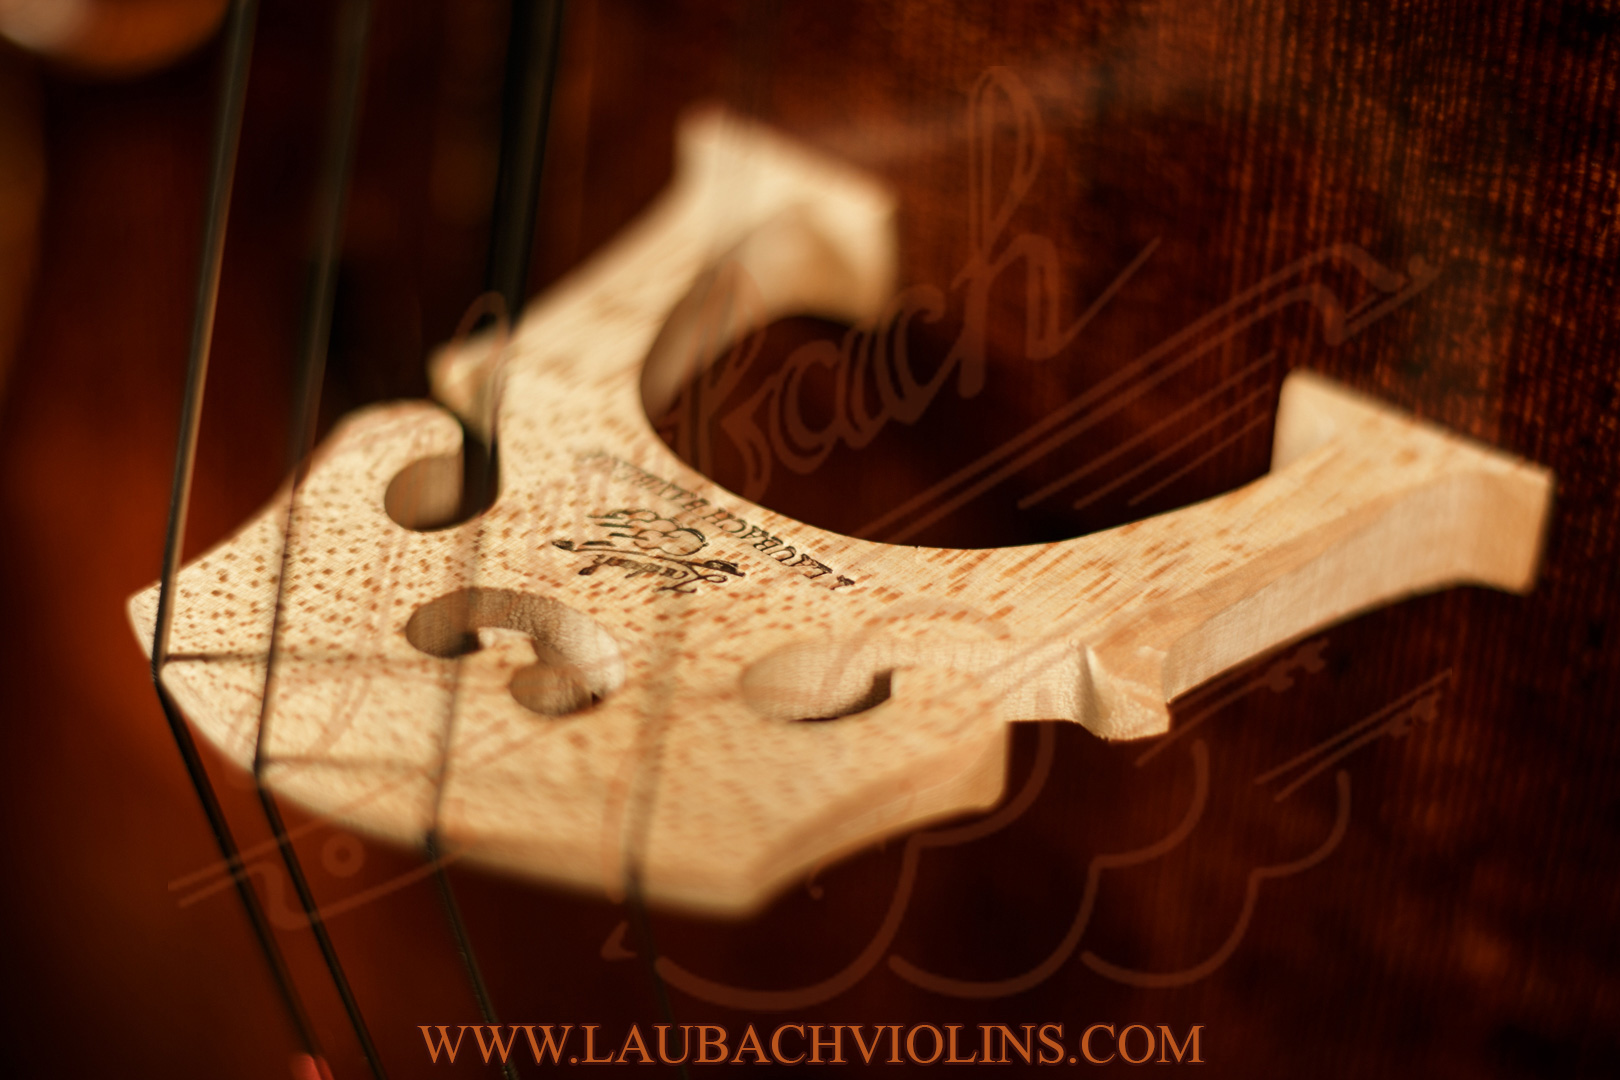 laubach-cello-168-3.jpg